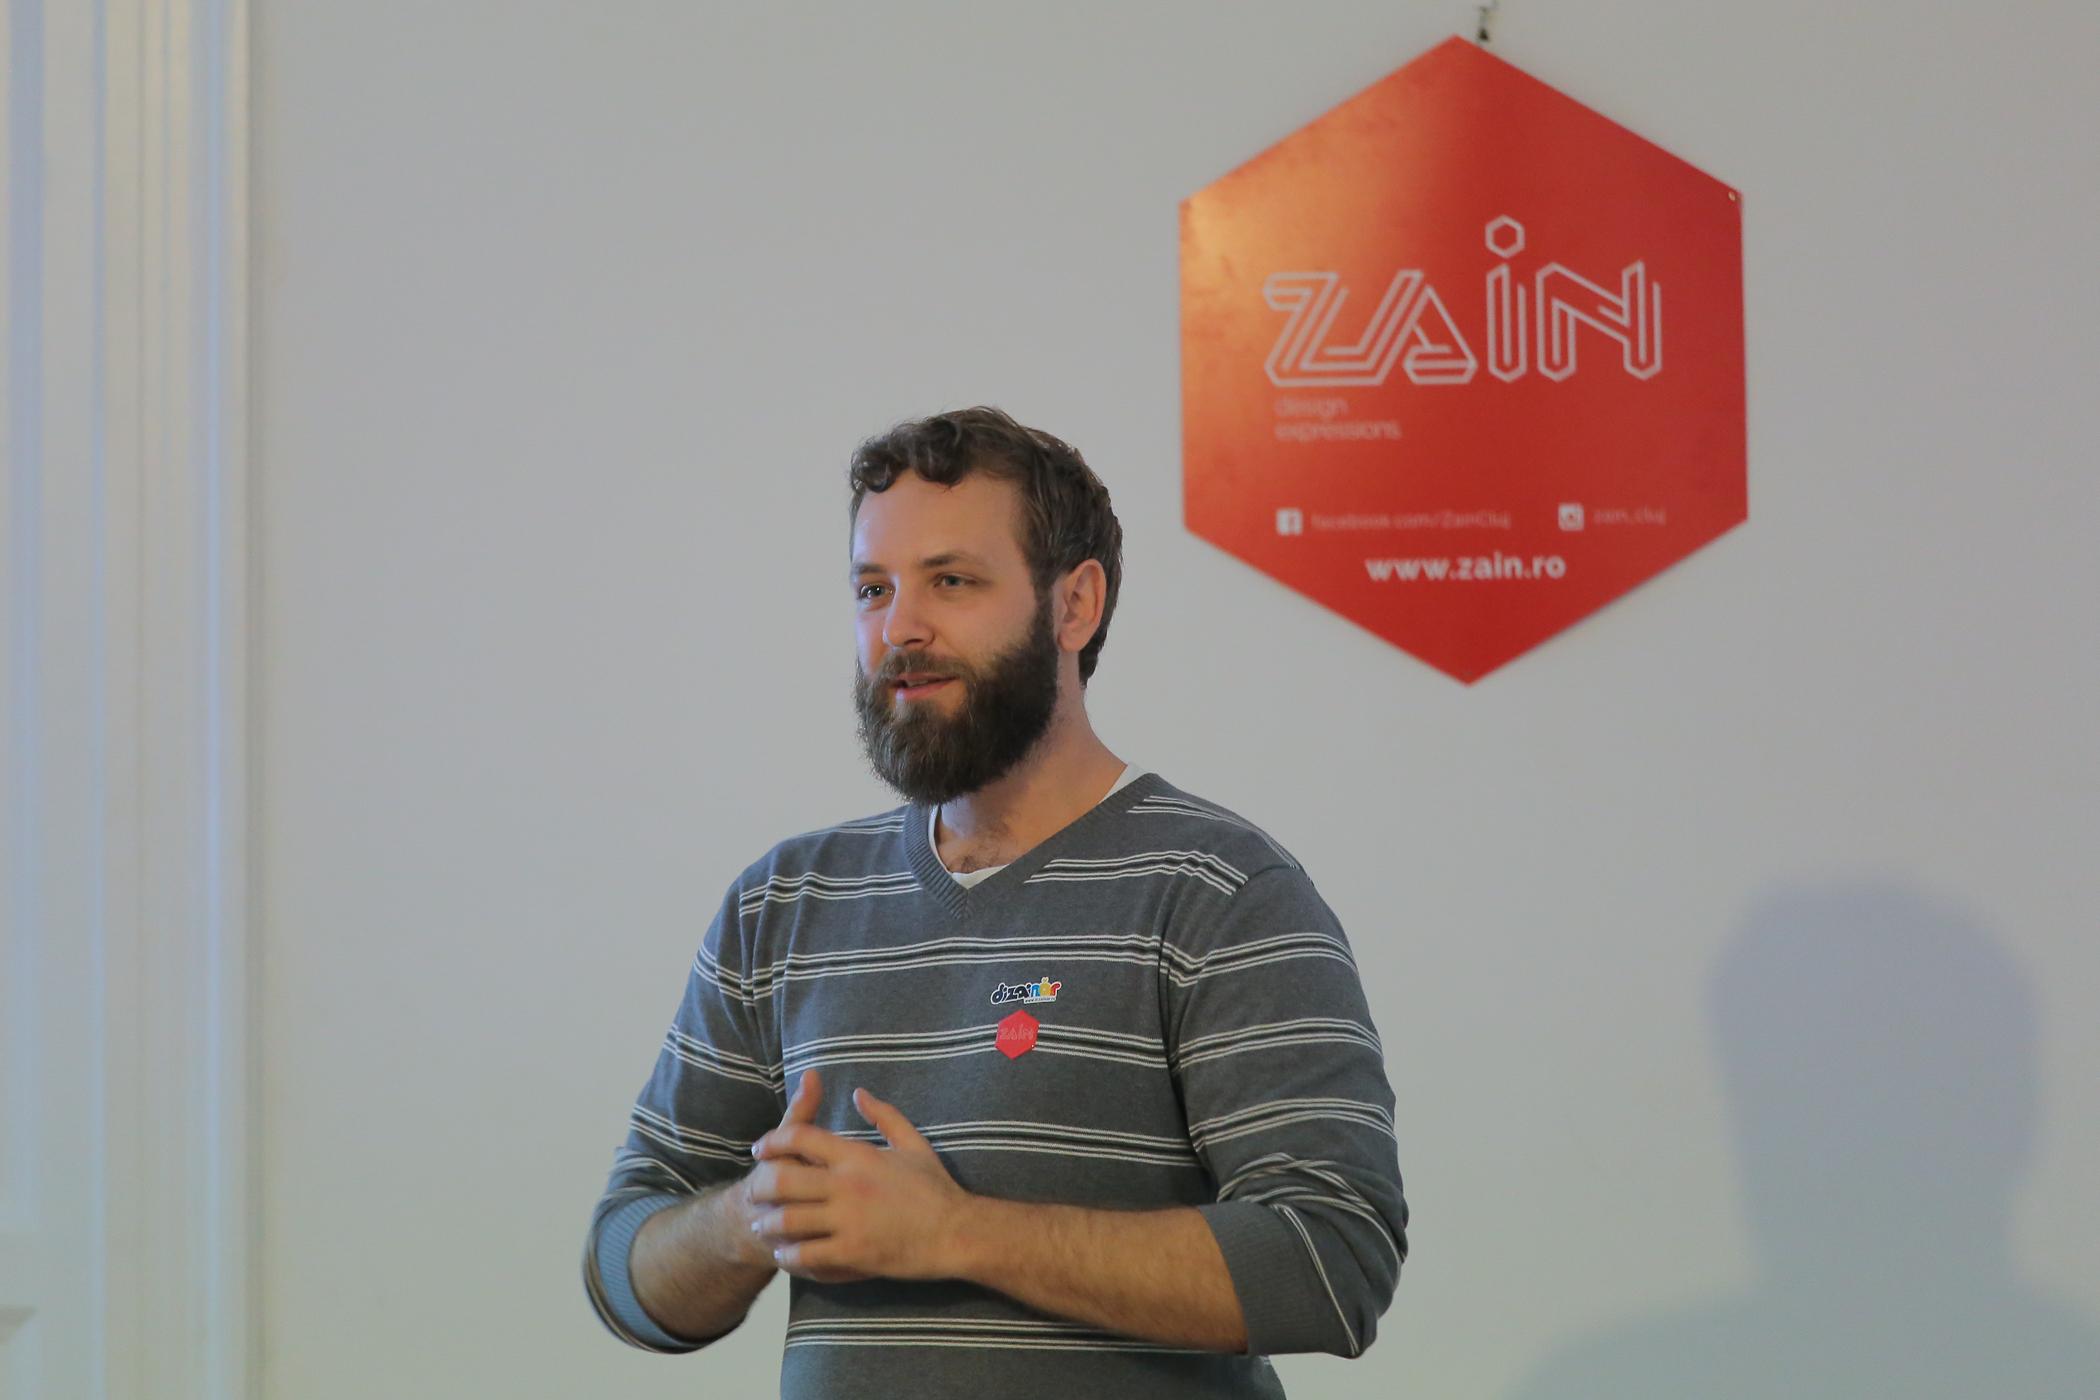 Turning Talents into Jobs ZAIN 2015 - Cosmin Ignat (48).jpg